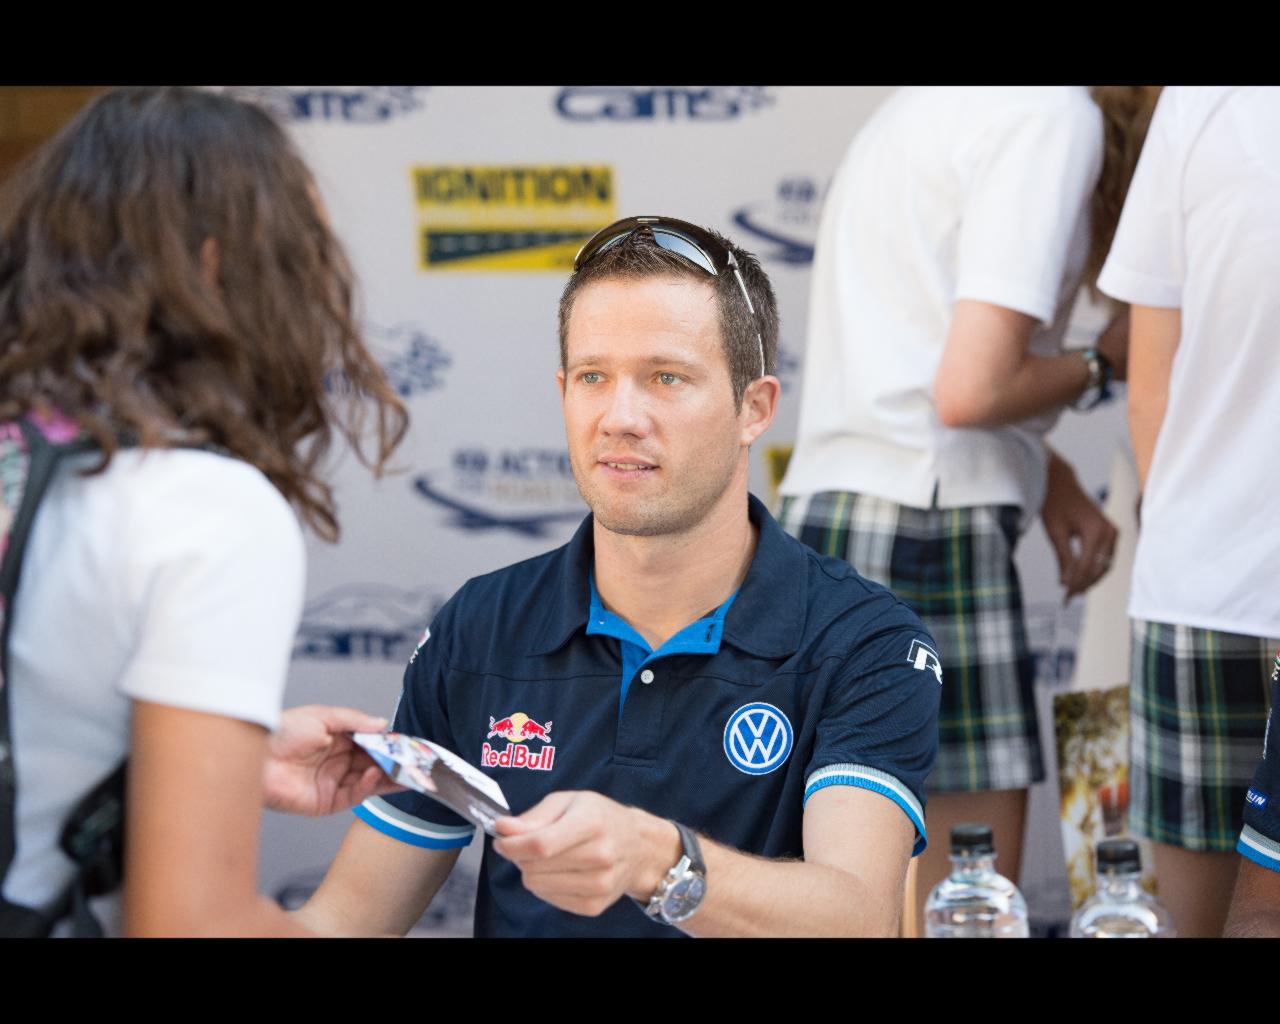 Sebastien Ogier, France, Volkswagen Motorsport.